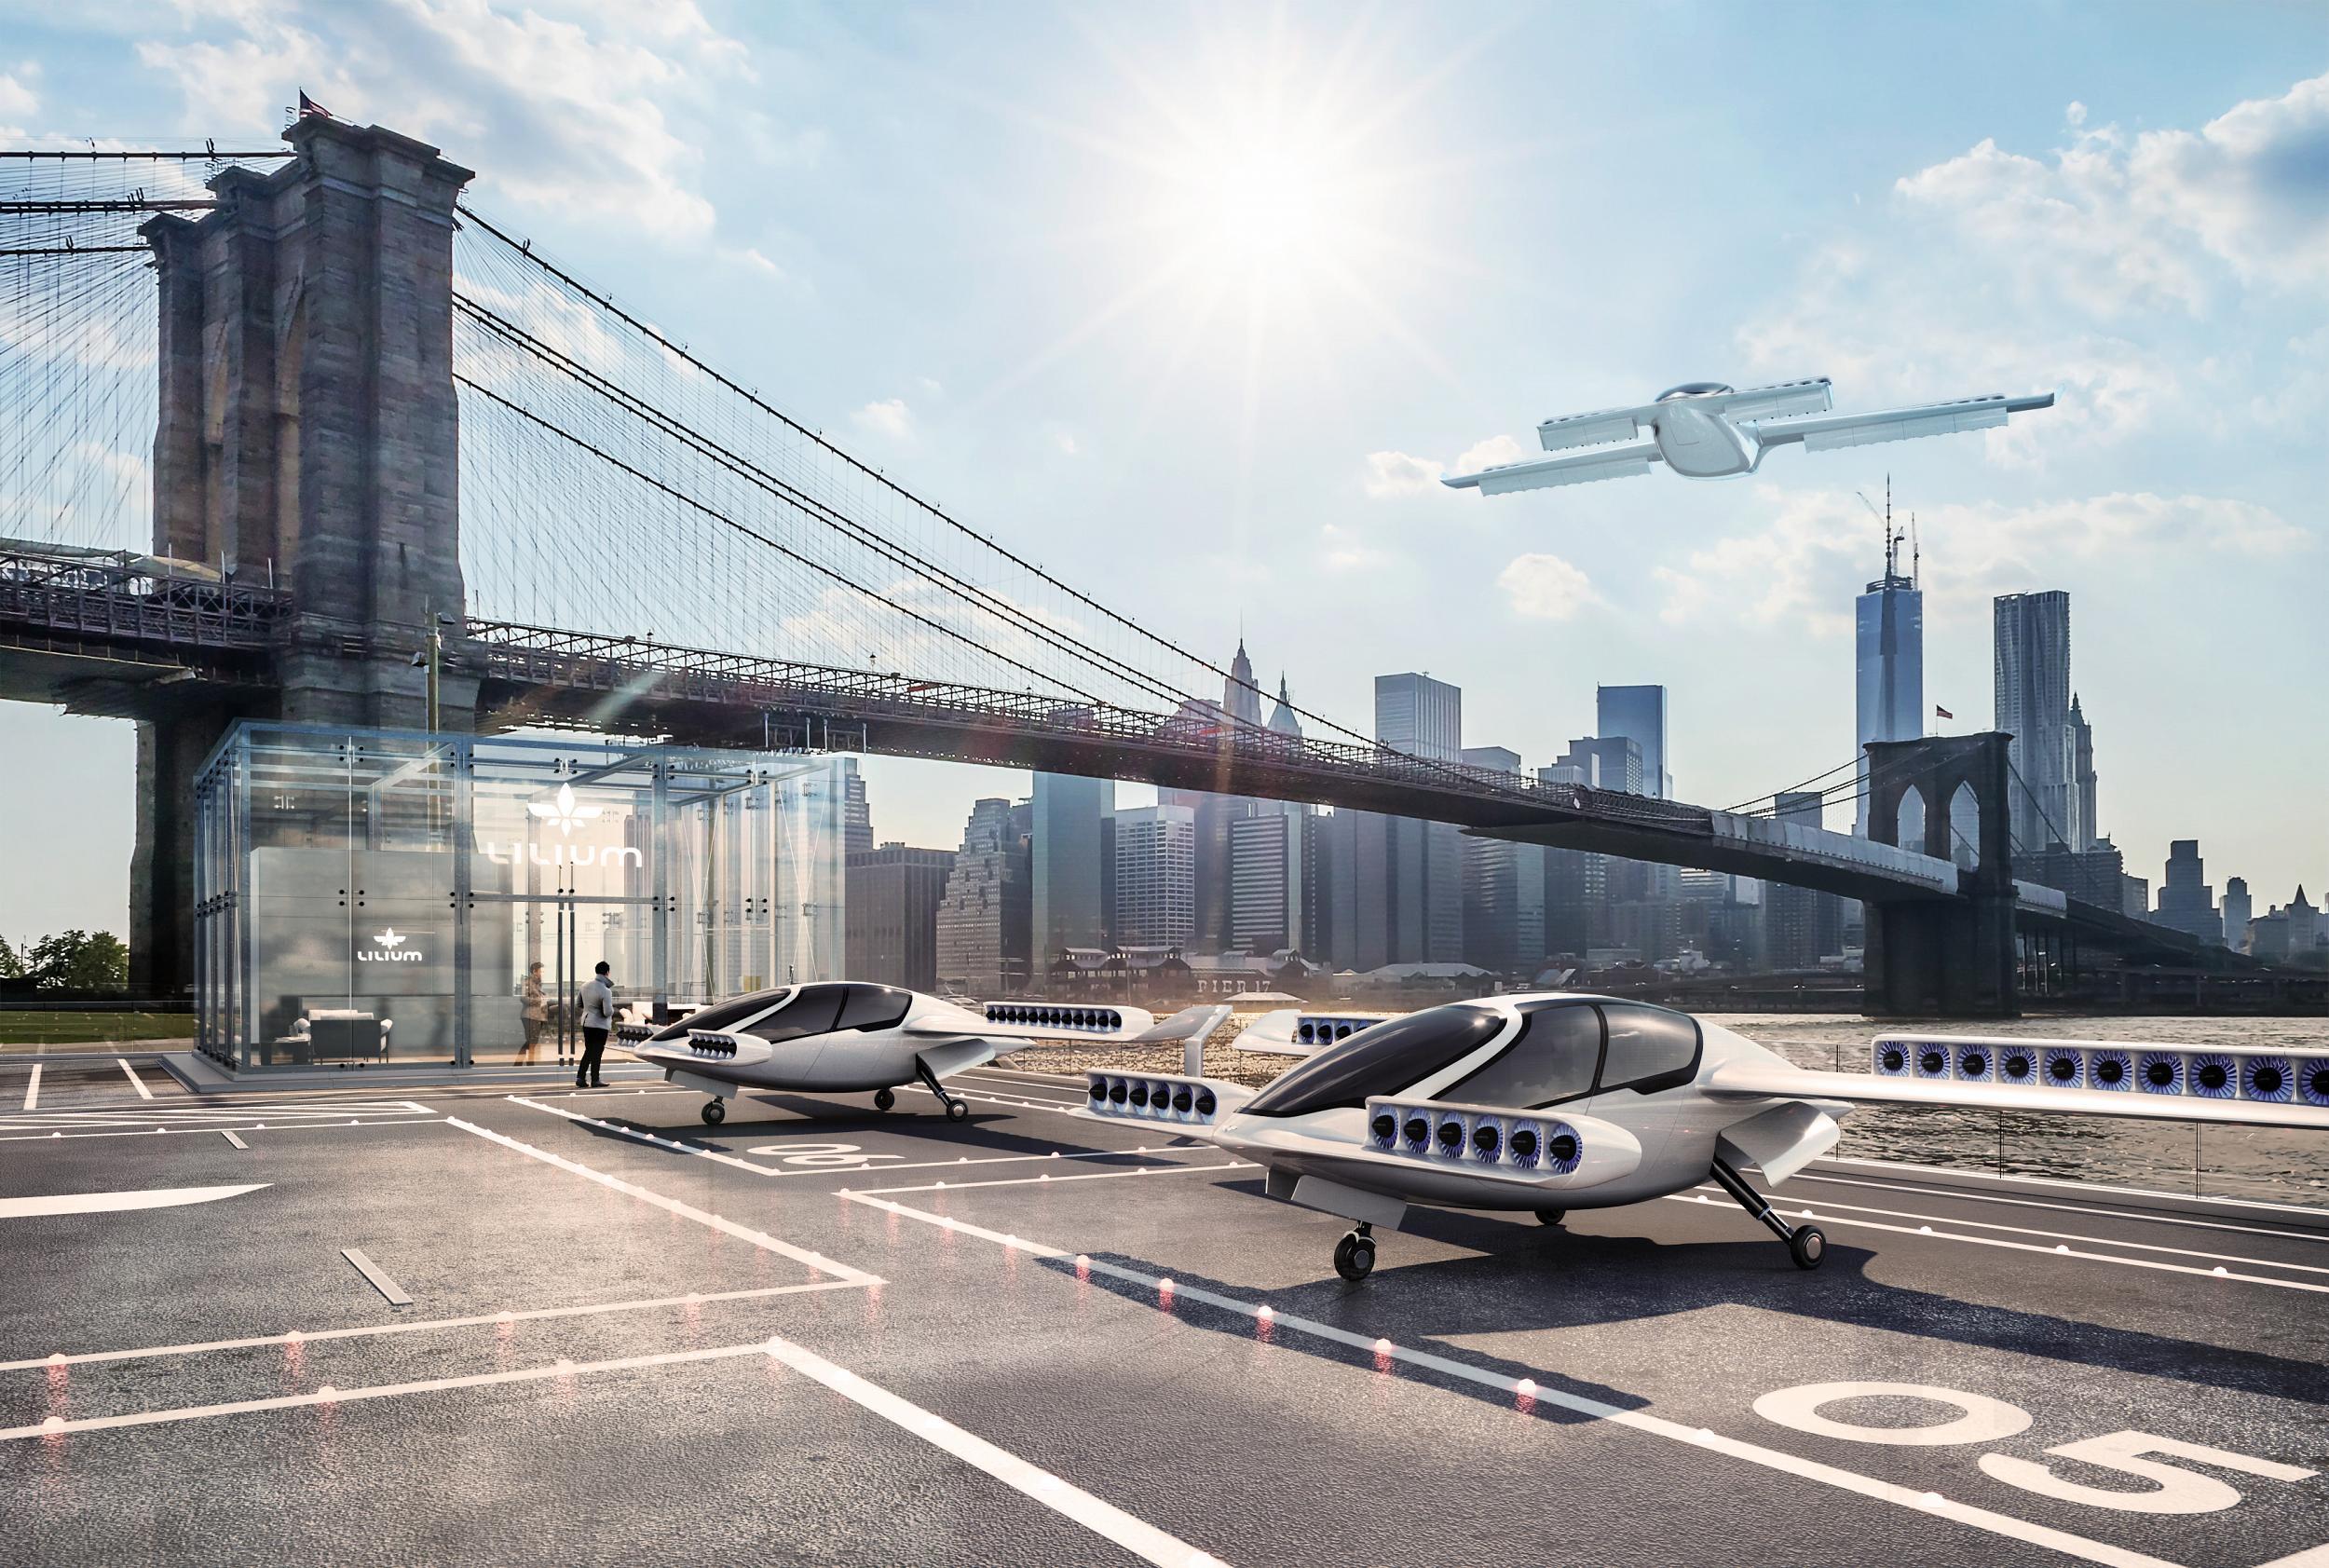 Fliegende Autos | Companisto